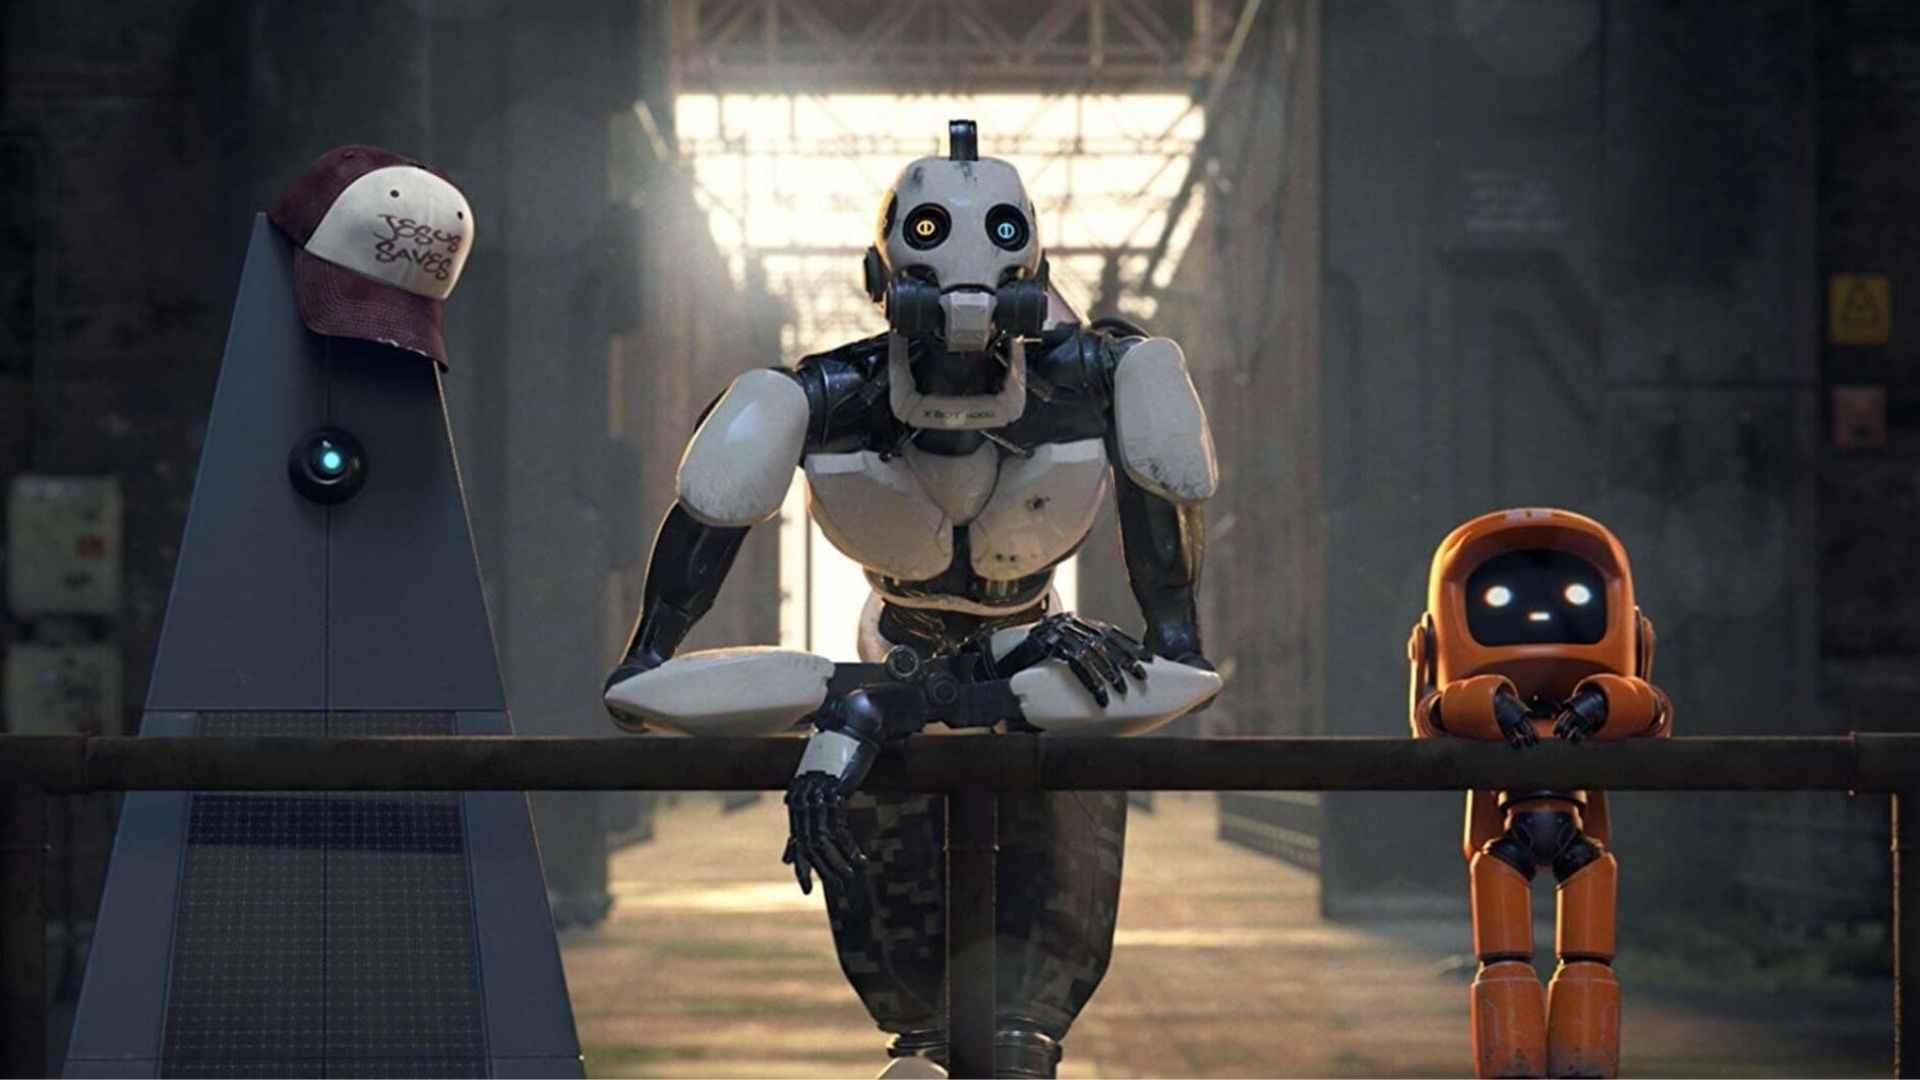 Three Robots, Season 1 Episode 2 - Love, death & robots